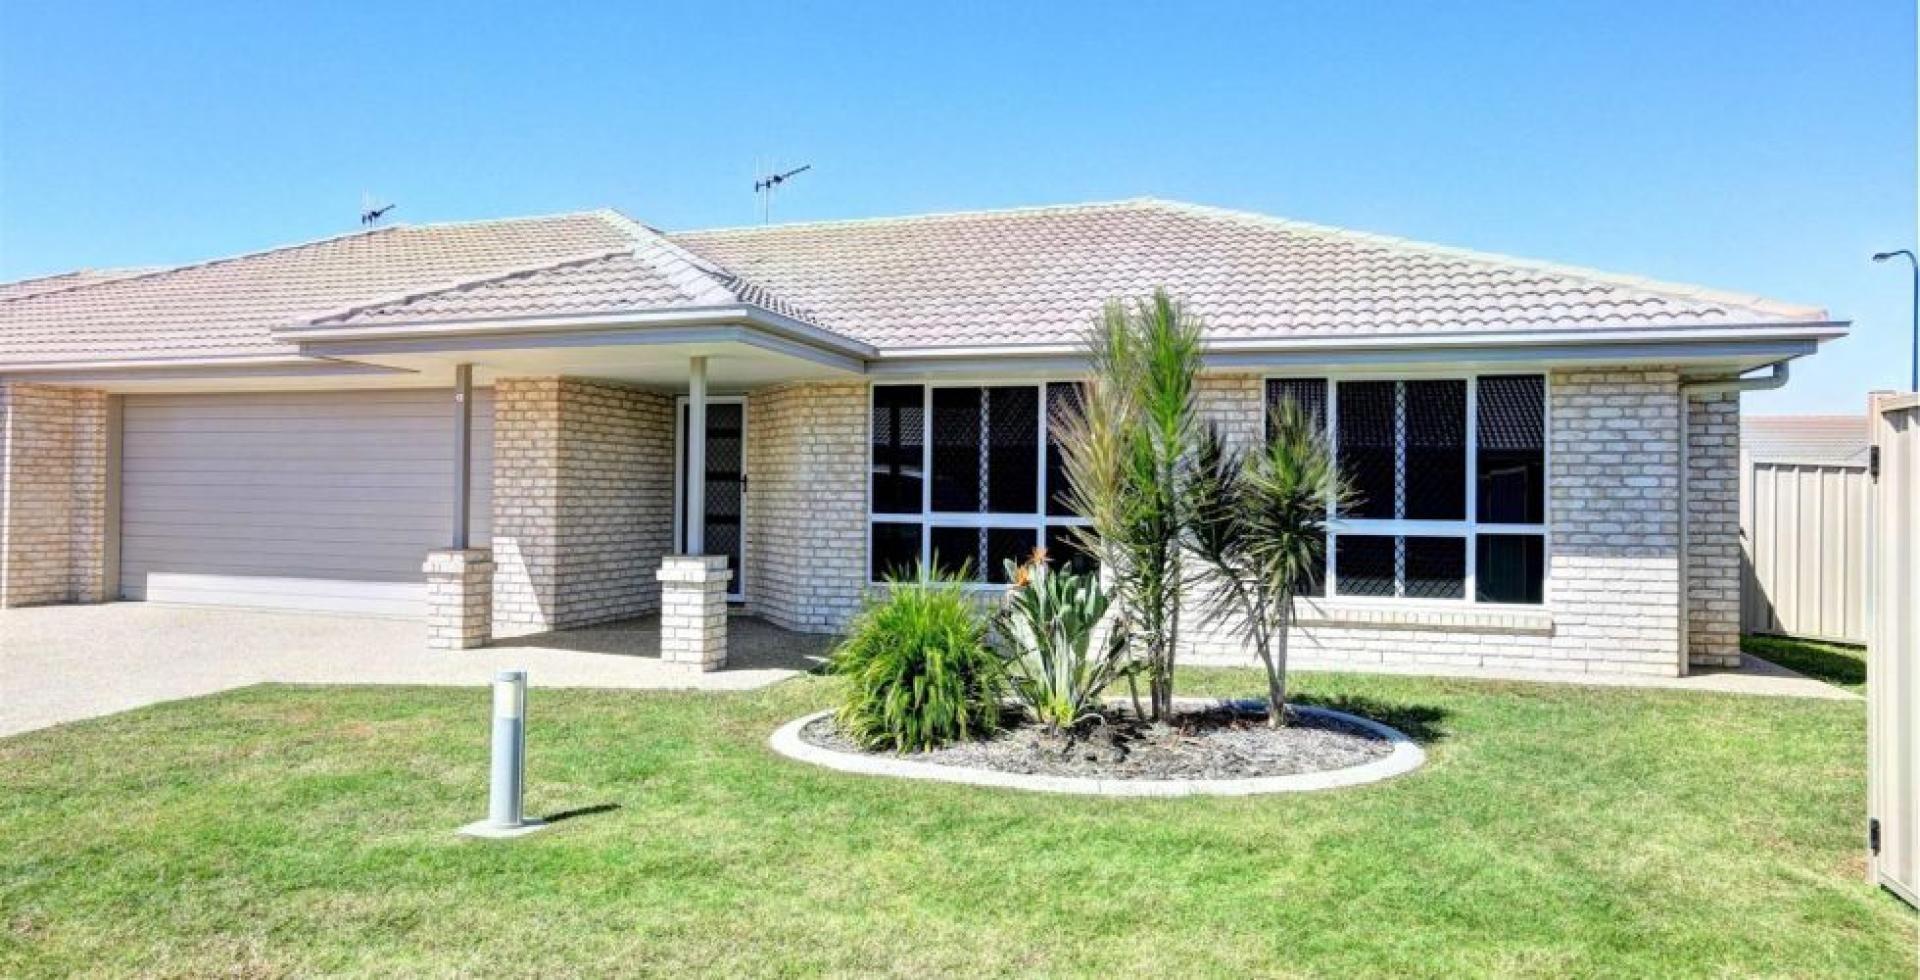 12/46 Jealous Road, Kalkie QLD 4670, Image 0